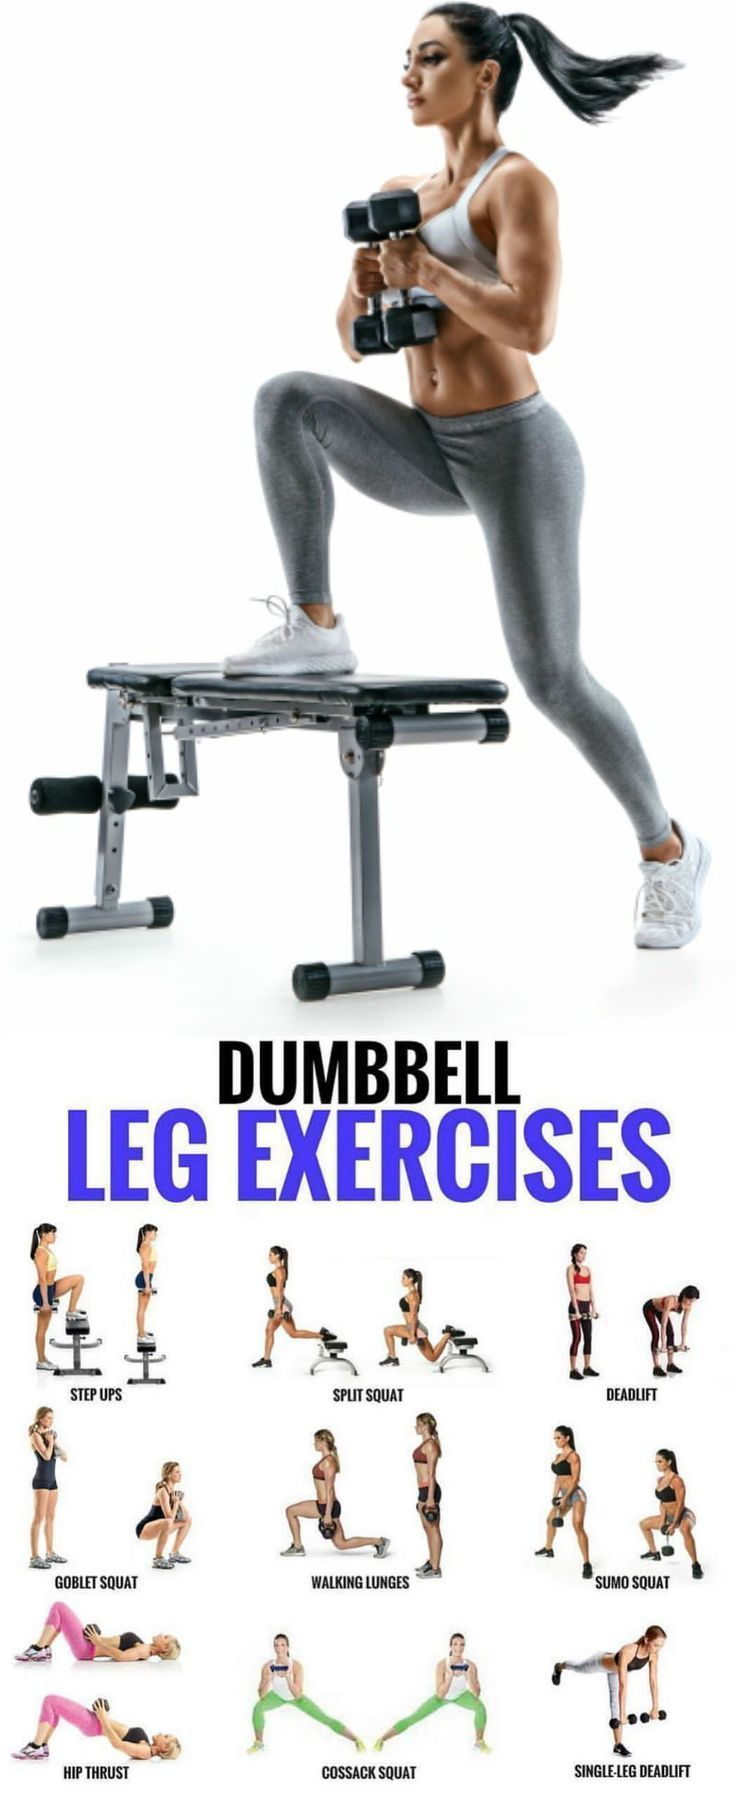 Tone It Up DumbBell Sports  5lb - Dumbbell - Ideas of Dumbbell #Dumbbell -  Sculpt Sexy Slender Thig...